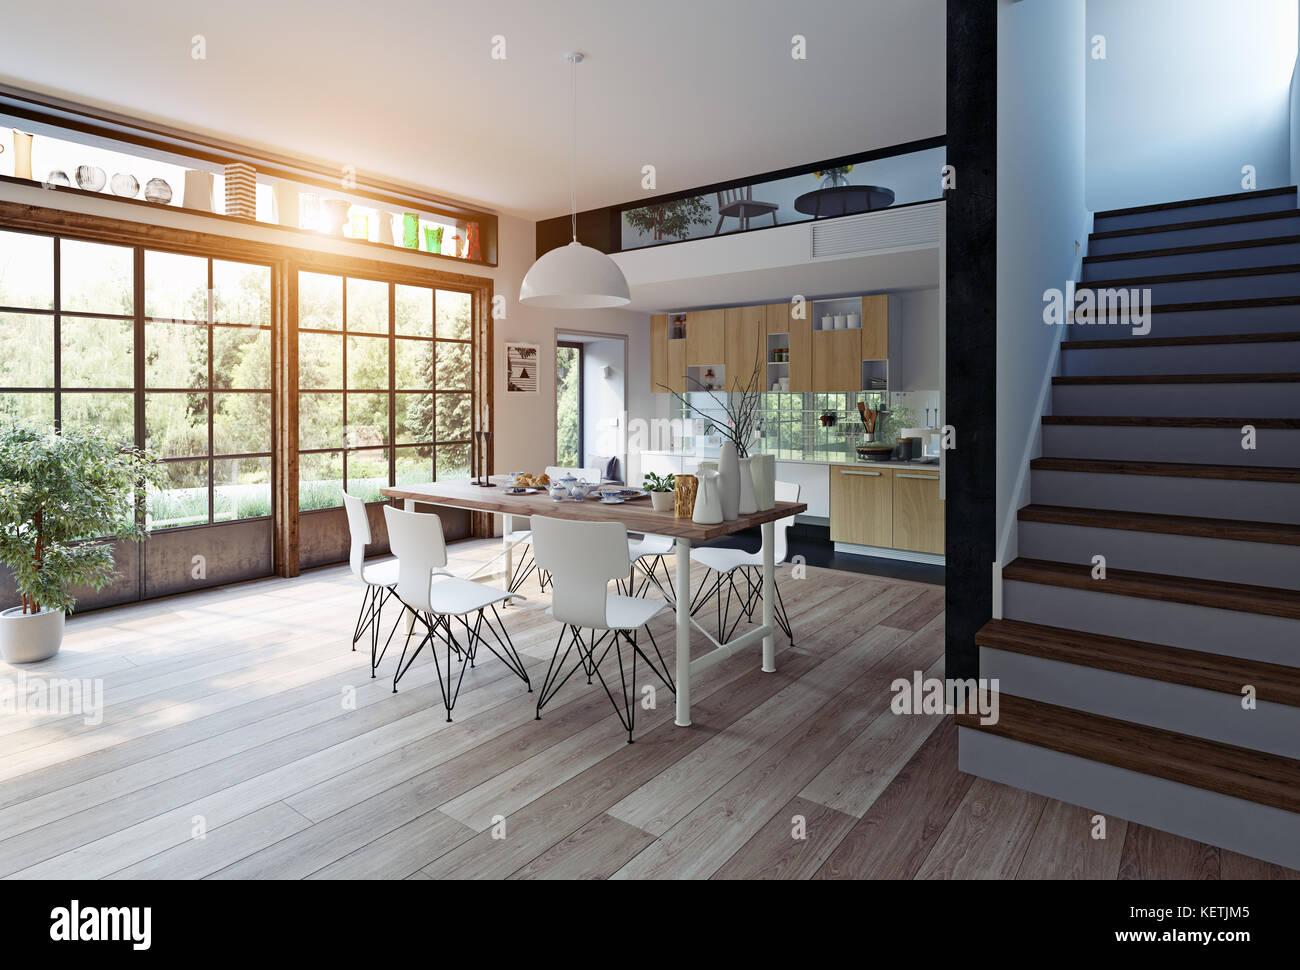 Moderne Küche Interieur. 3D-rendering Konzept Stockfoto, Bild ...